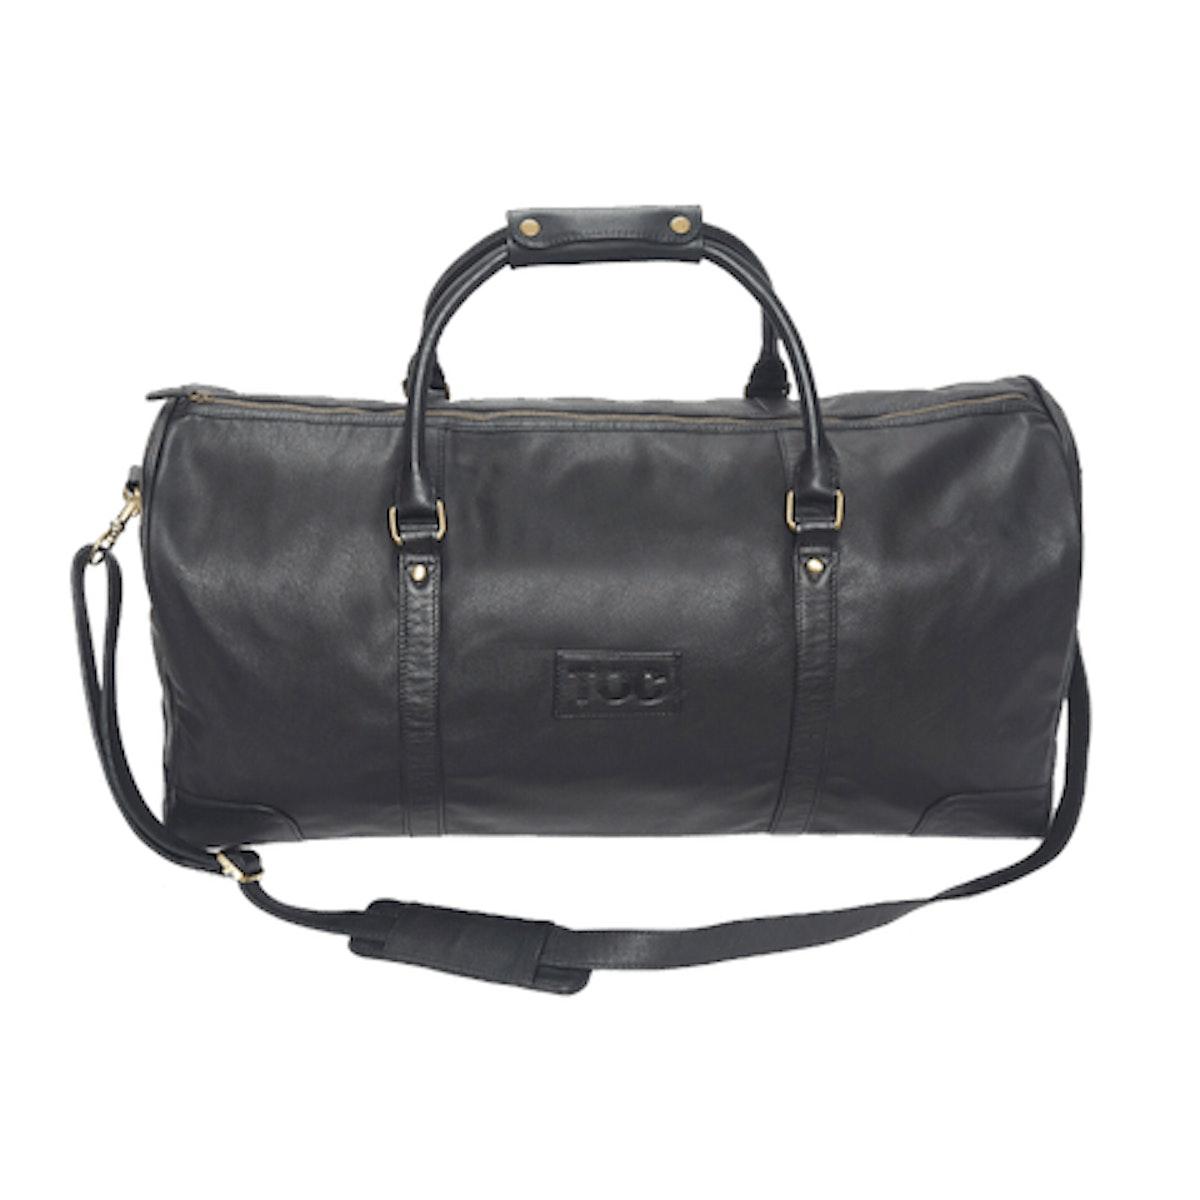 InStitchu Accessories bag TOC Black Leather Duffel Bag